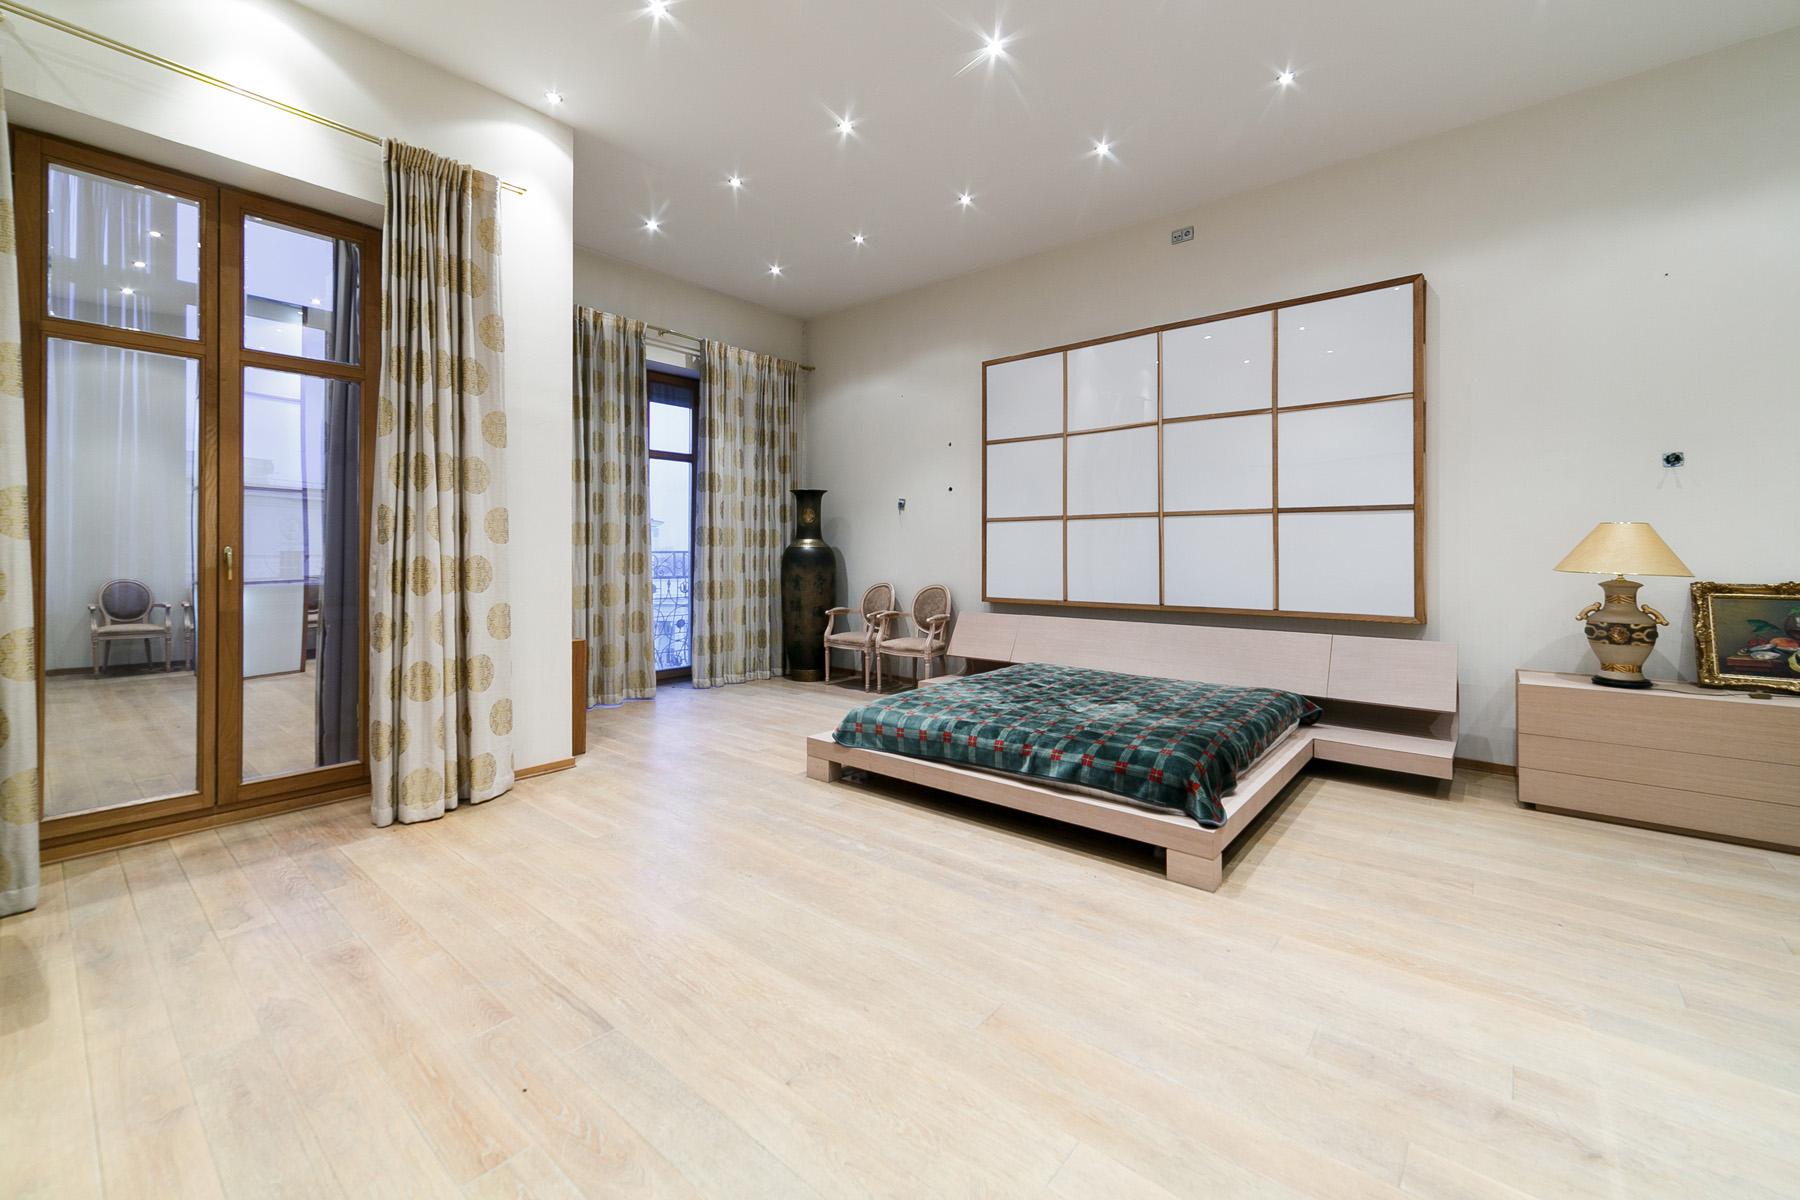 Apartments için Kiralama at 5-room penthouse in Monolit Residential Complex Moscow, Moskova Rusya